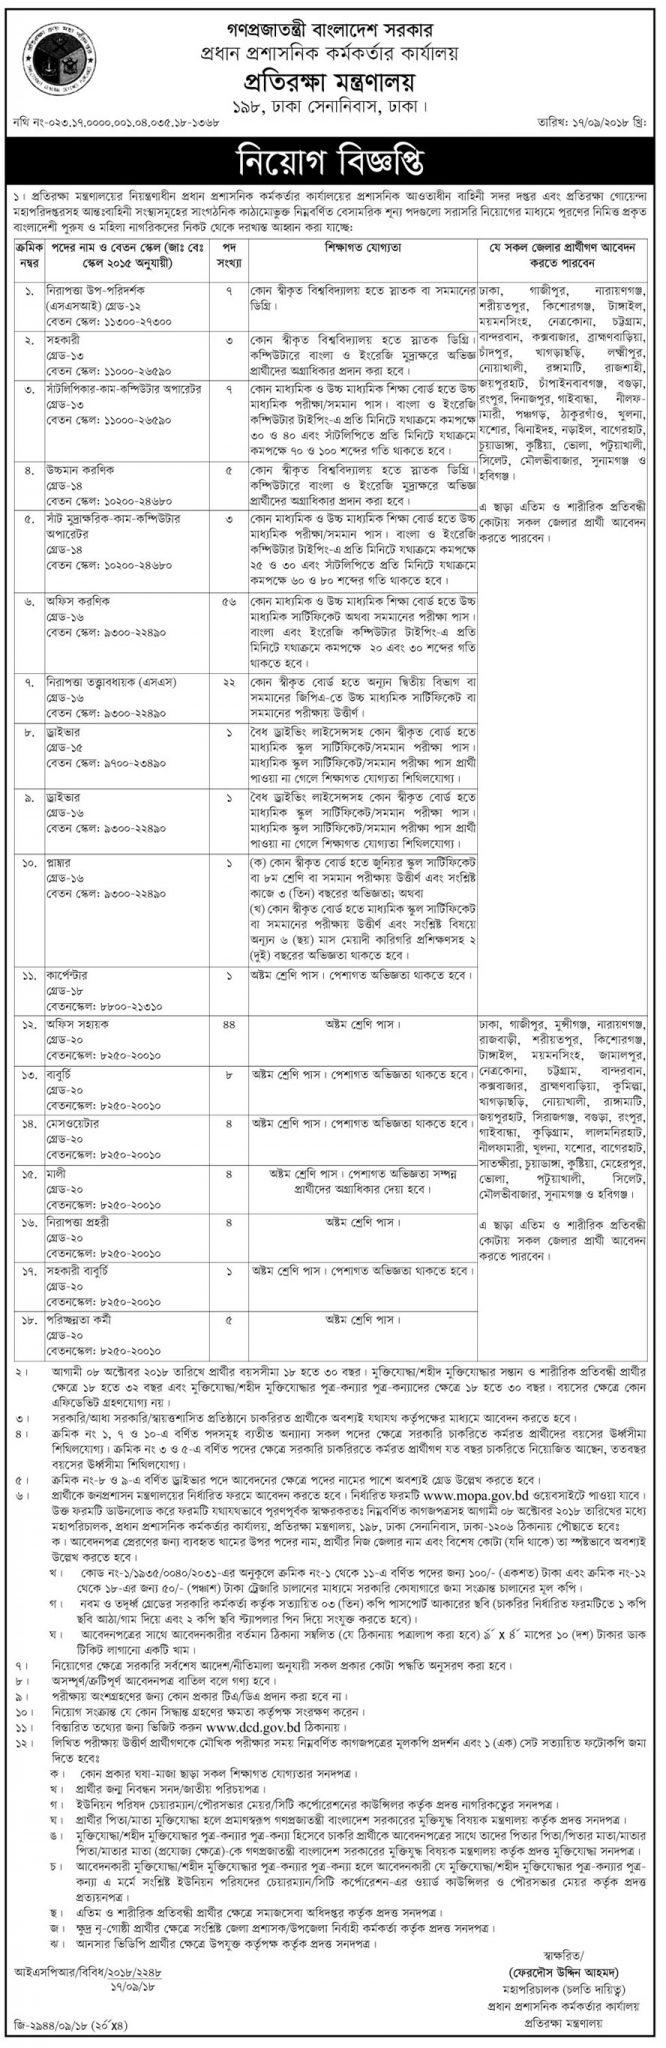 Ministry of Defence MOD Job Circular 2018